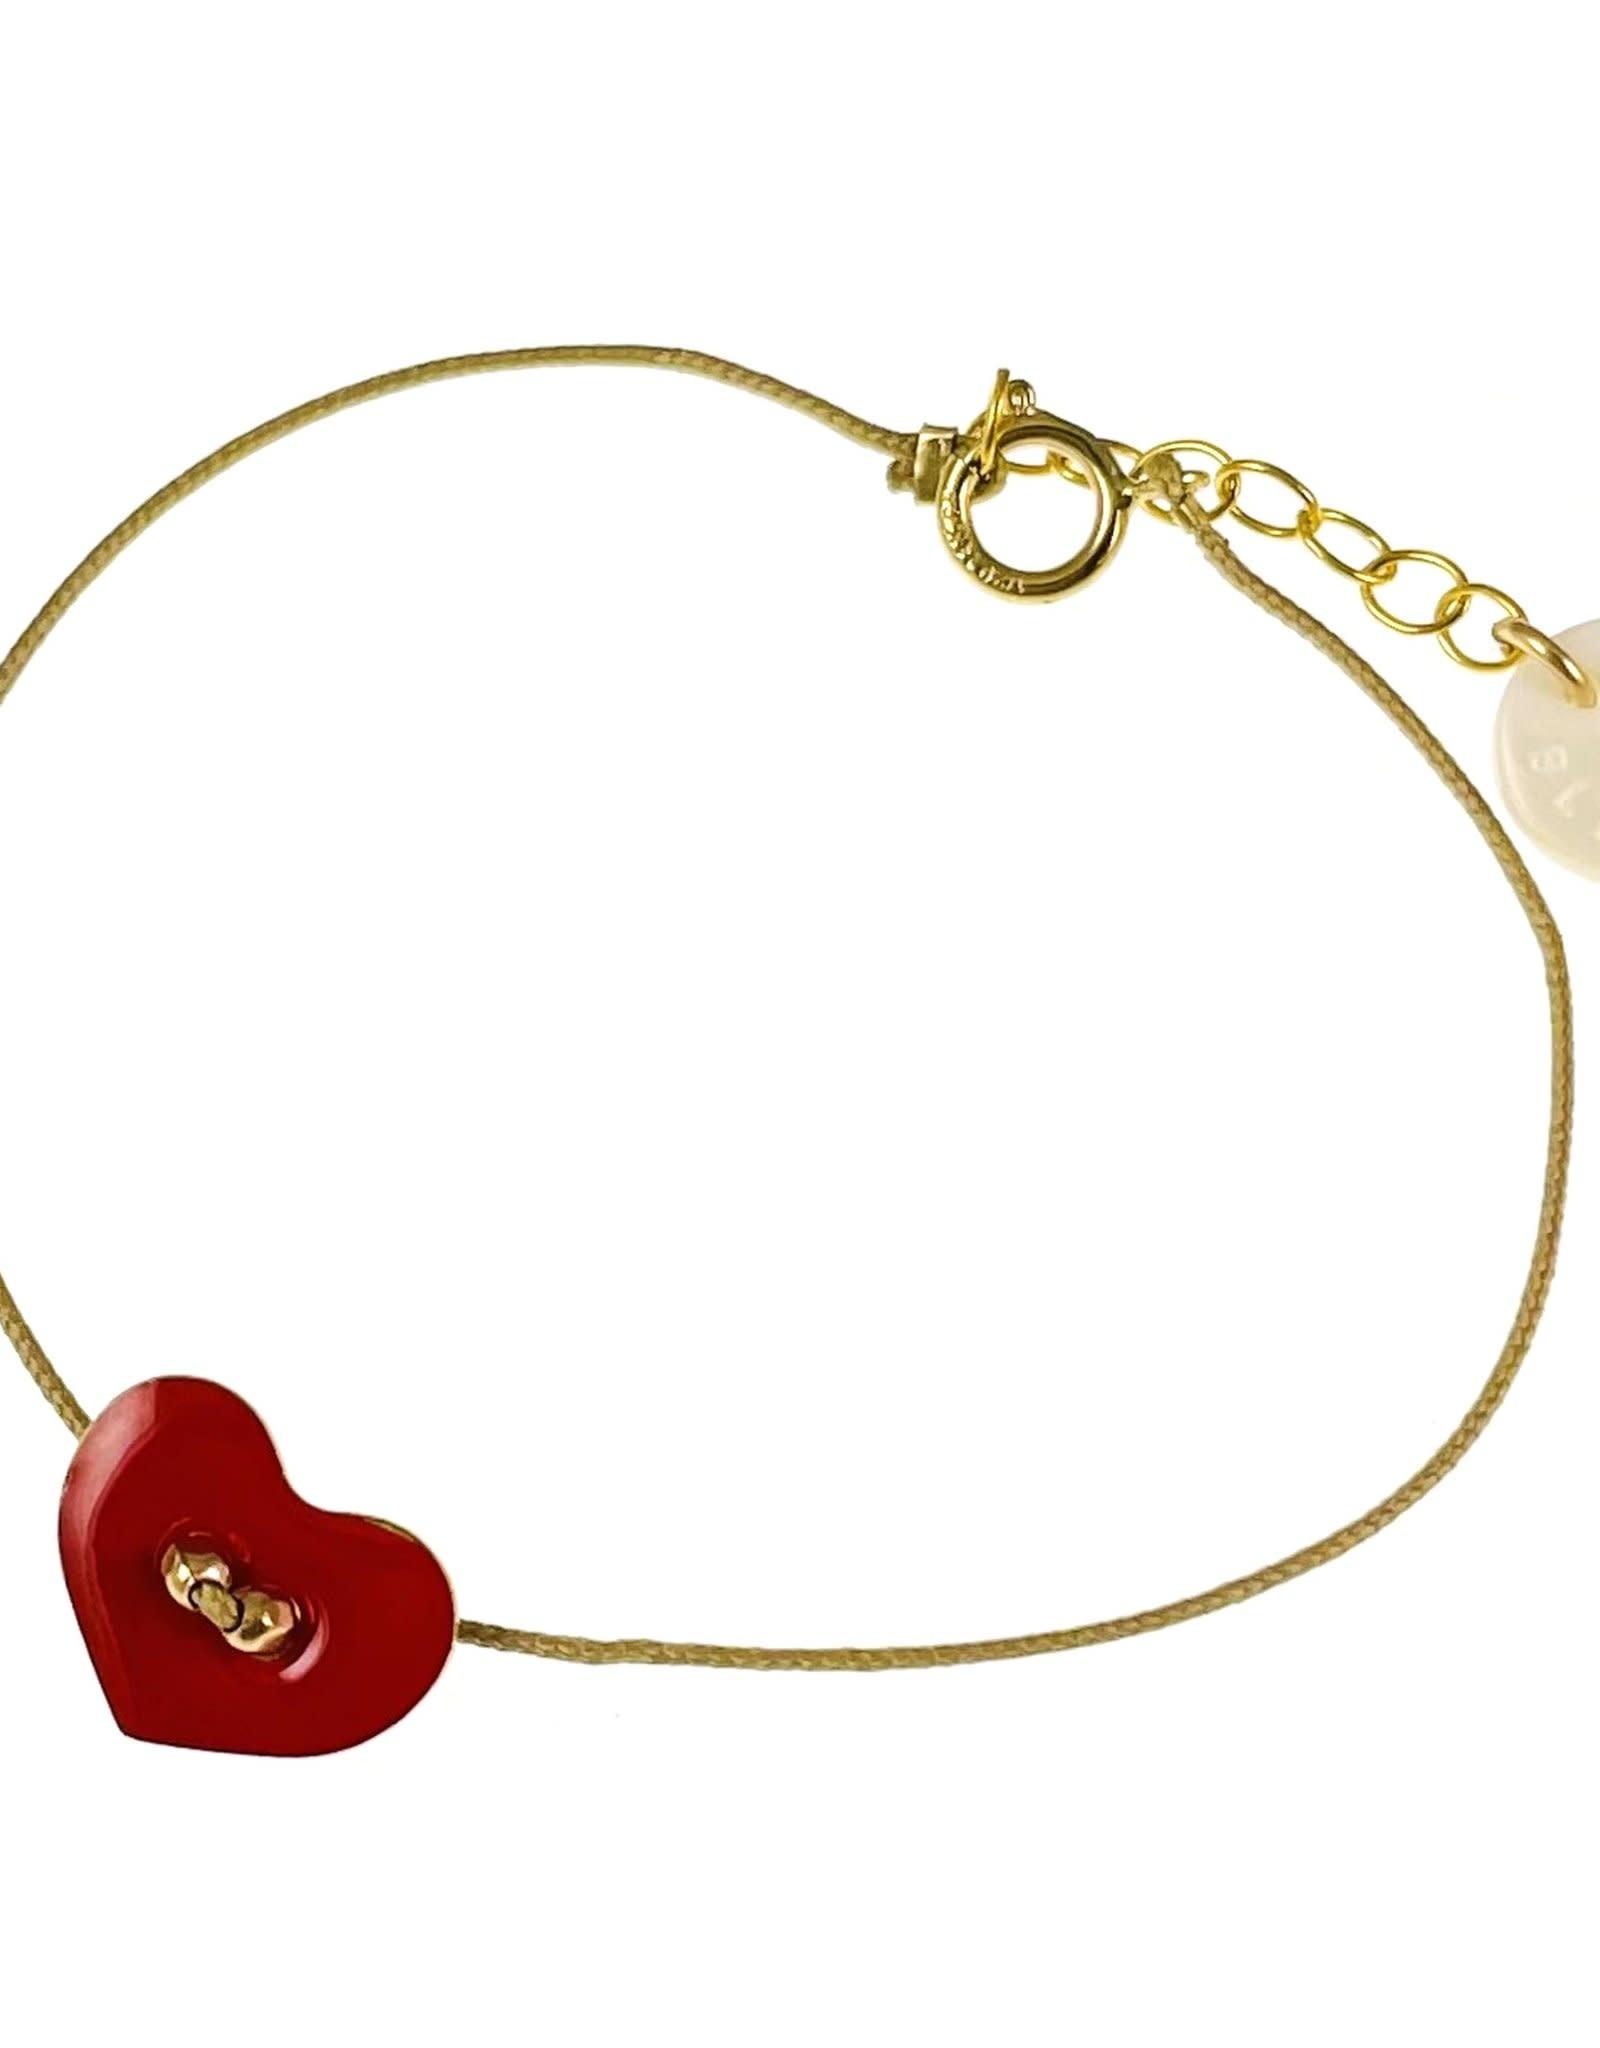 Bracelet - Corde beige et coeur rouge